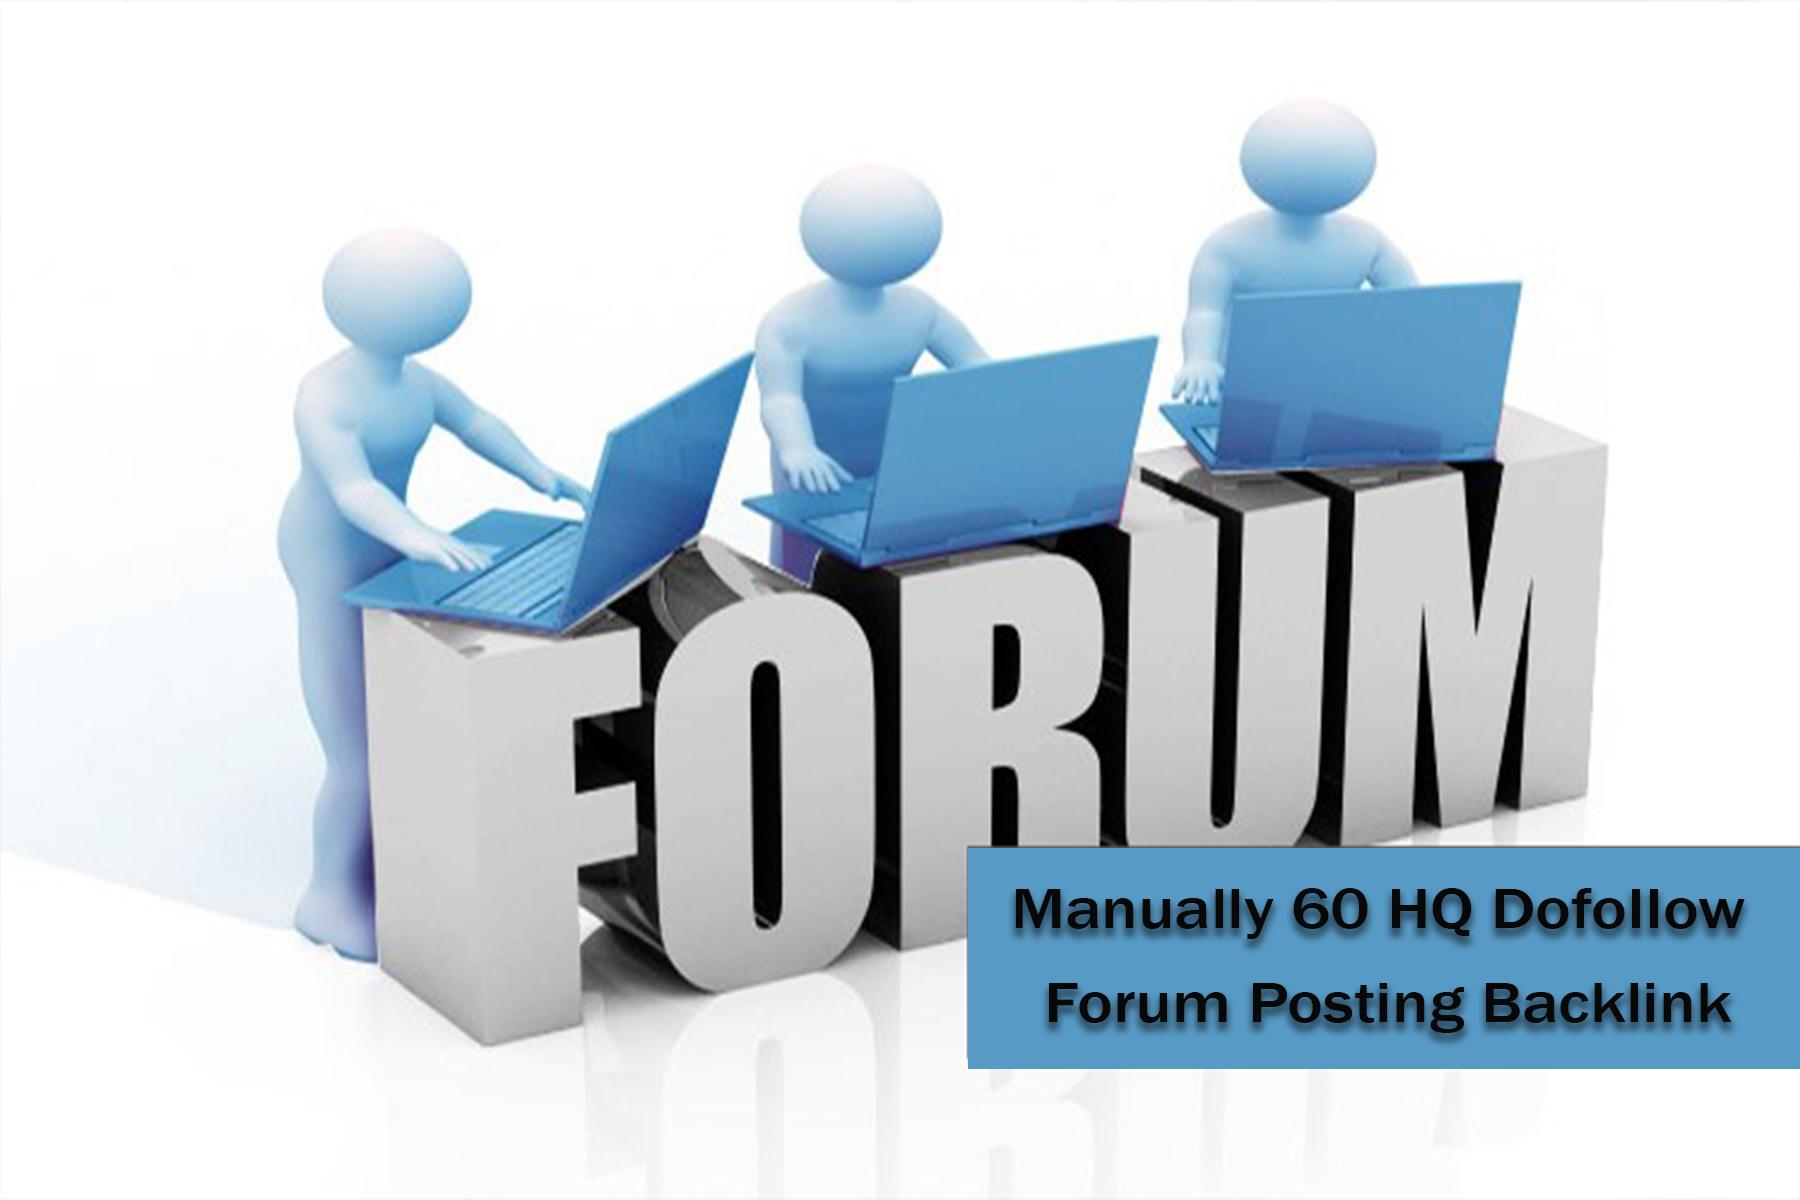 I will Provide Manually 60 HQ DofoIIow Forum Posting Backlink